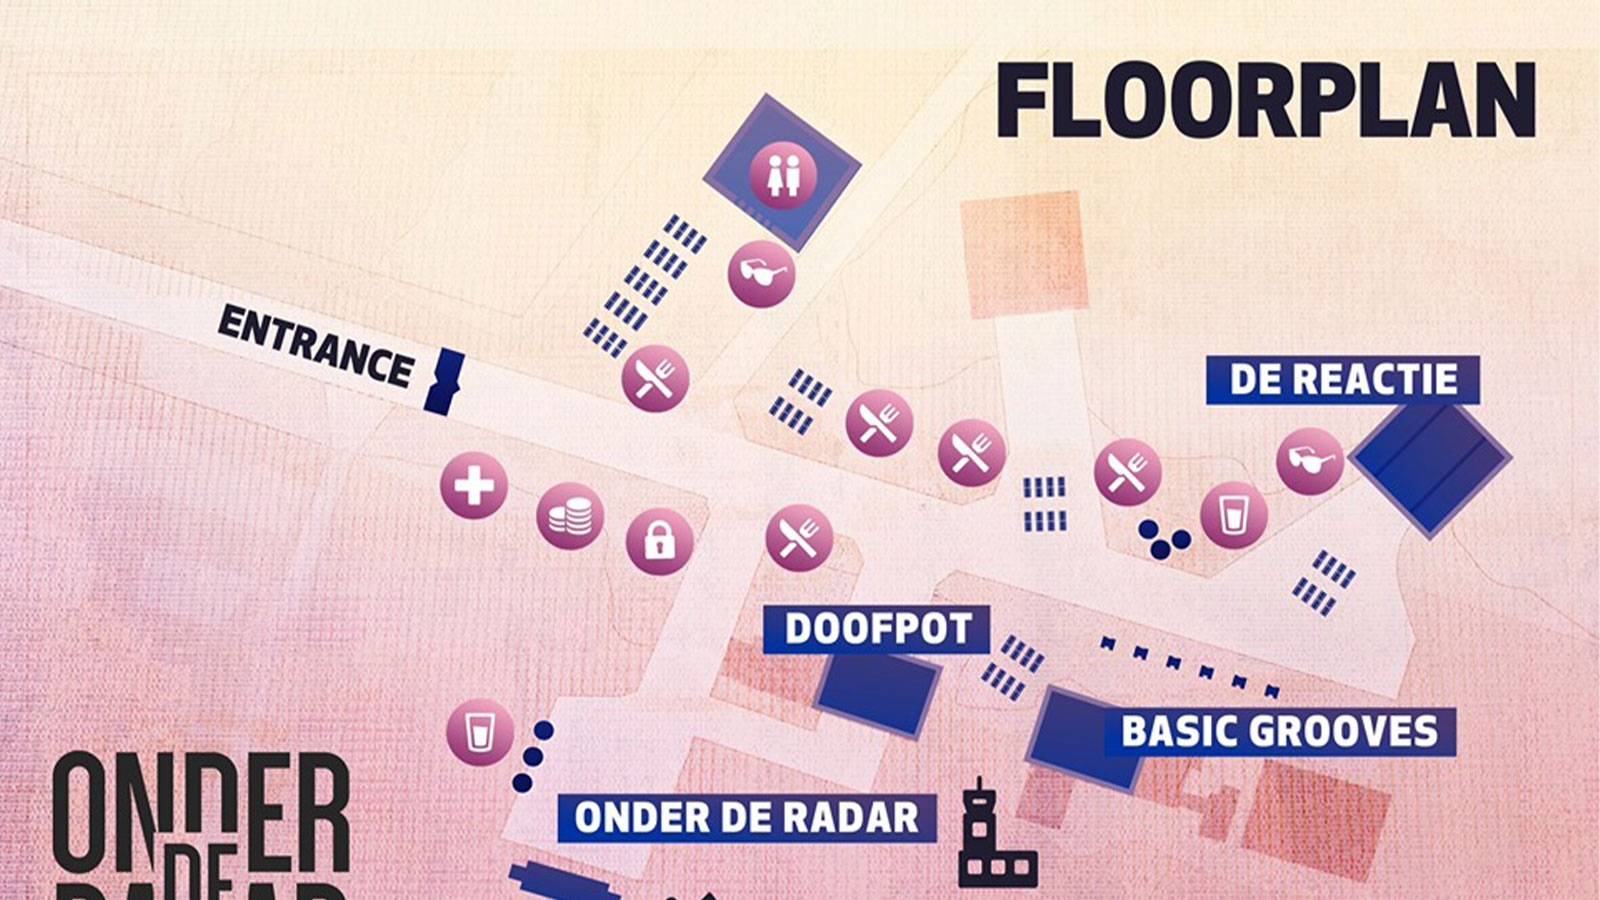 Floorplan-ODR-2019-new